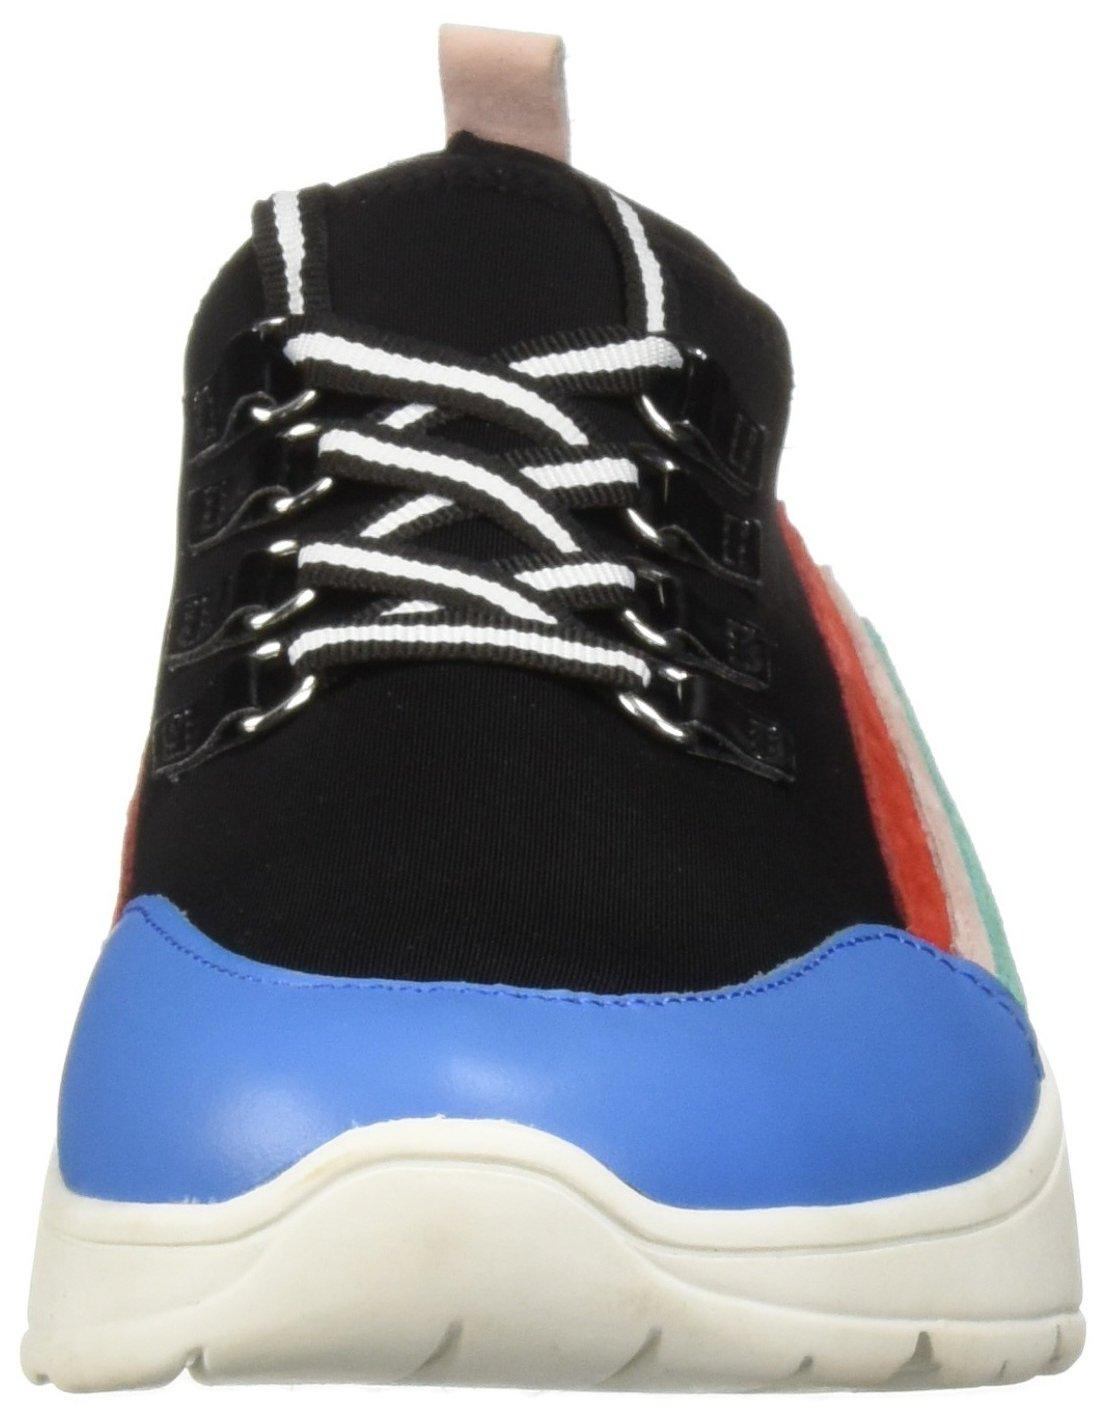 Steve B079M4HMGW Madden Women's Cavo Sneaker B079M4HMGW Steve 8.5 B(M) US|Black/Multi 9d7243